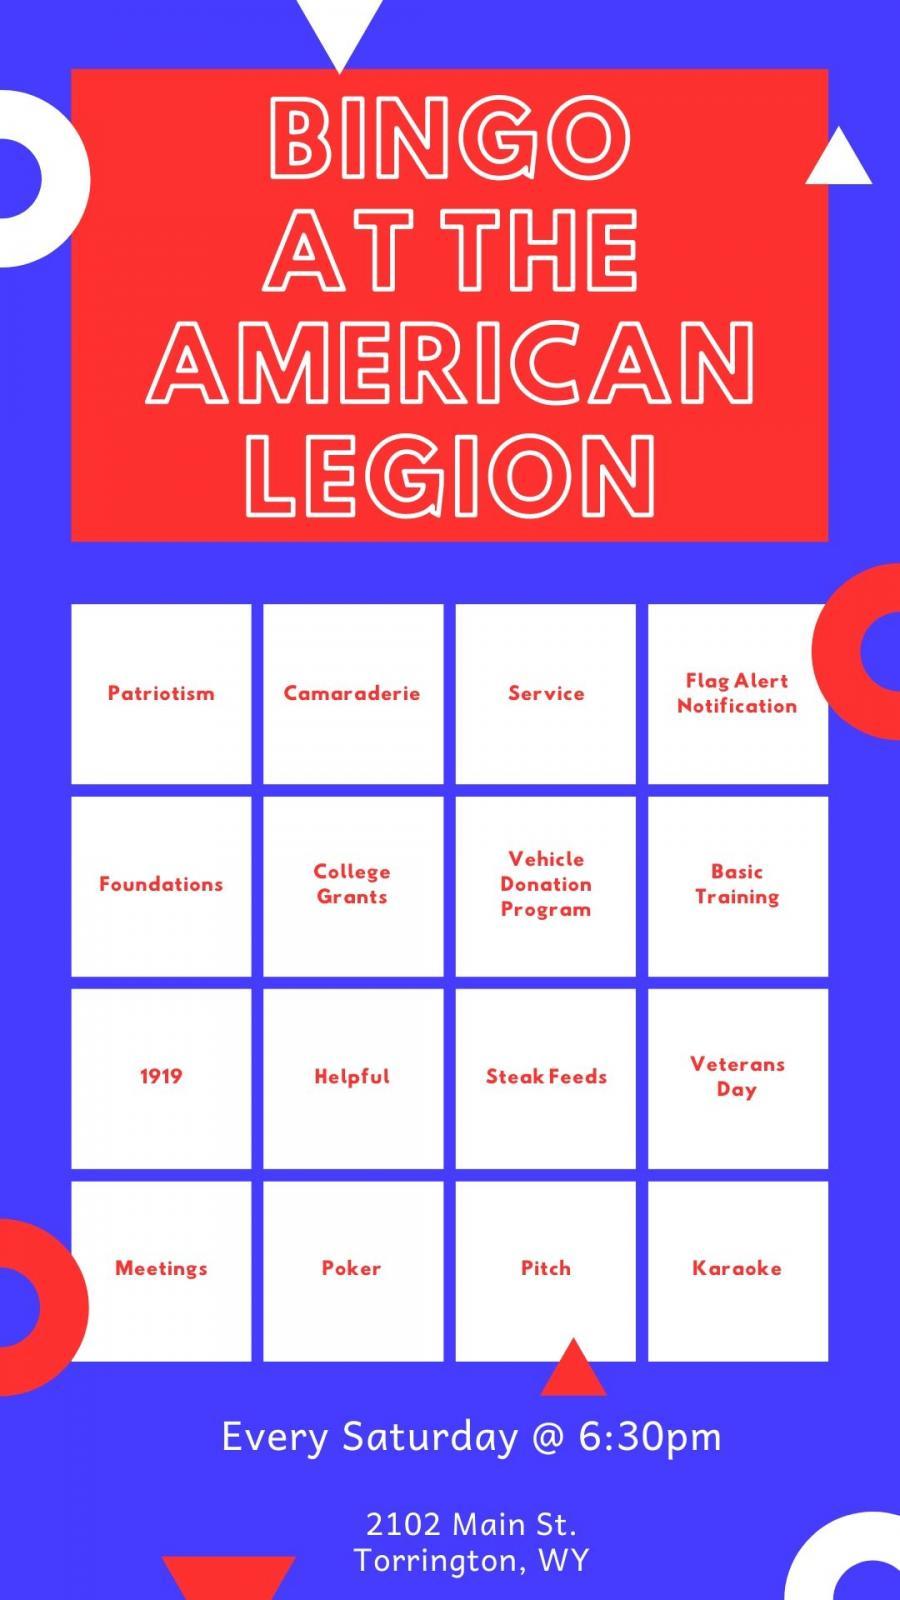 Bingo at The American Legion Photo